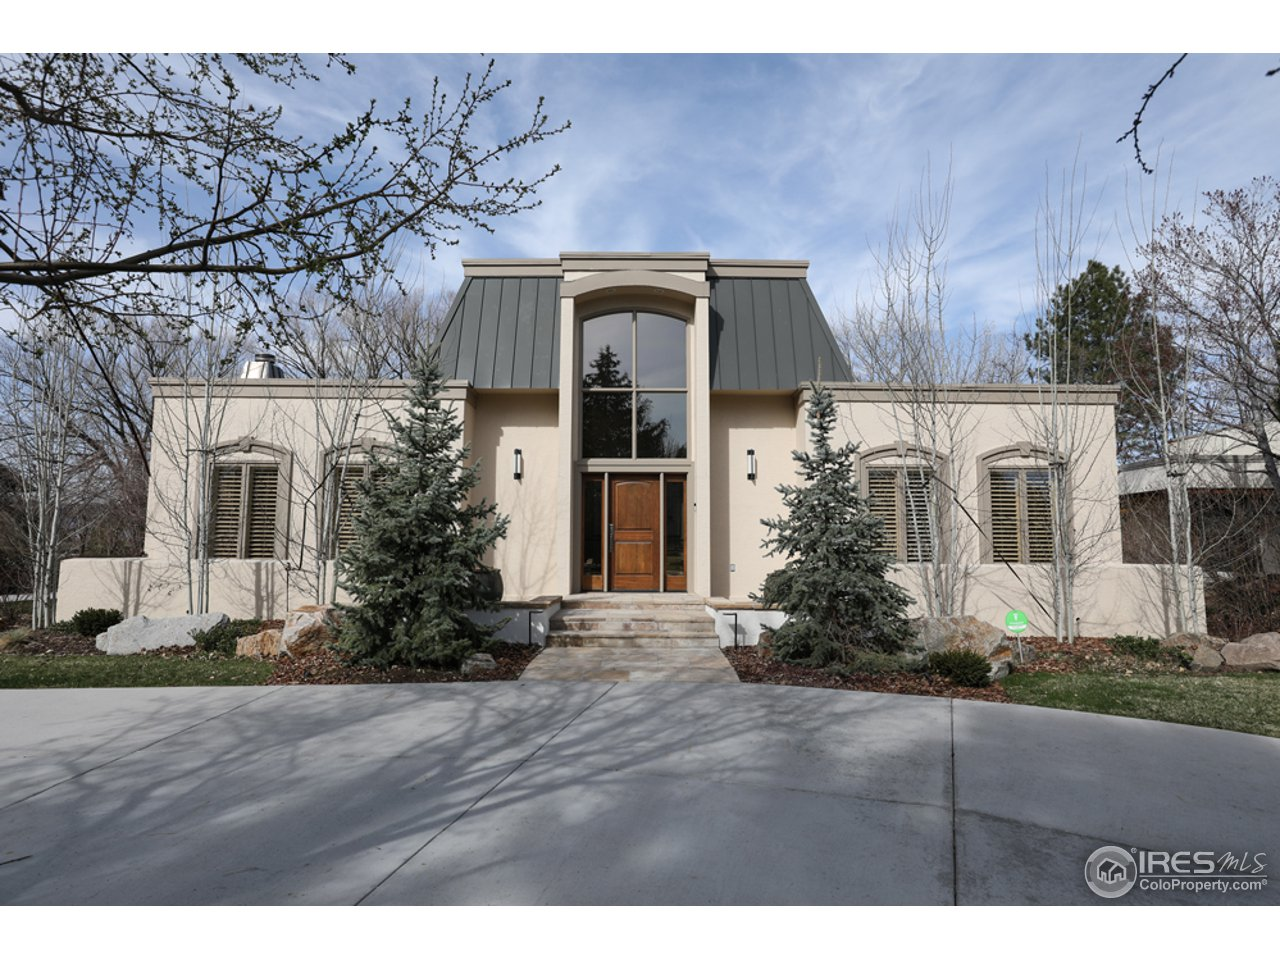 5183 Idylwild Trl, Boulder CO 80301